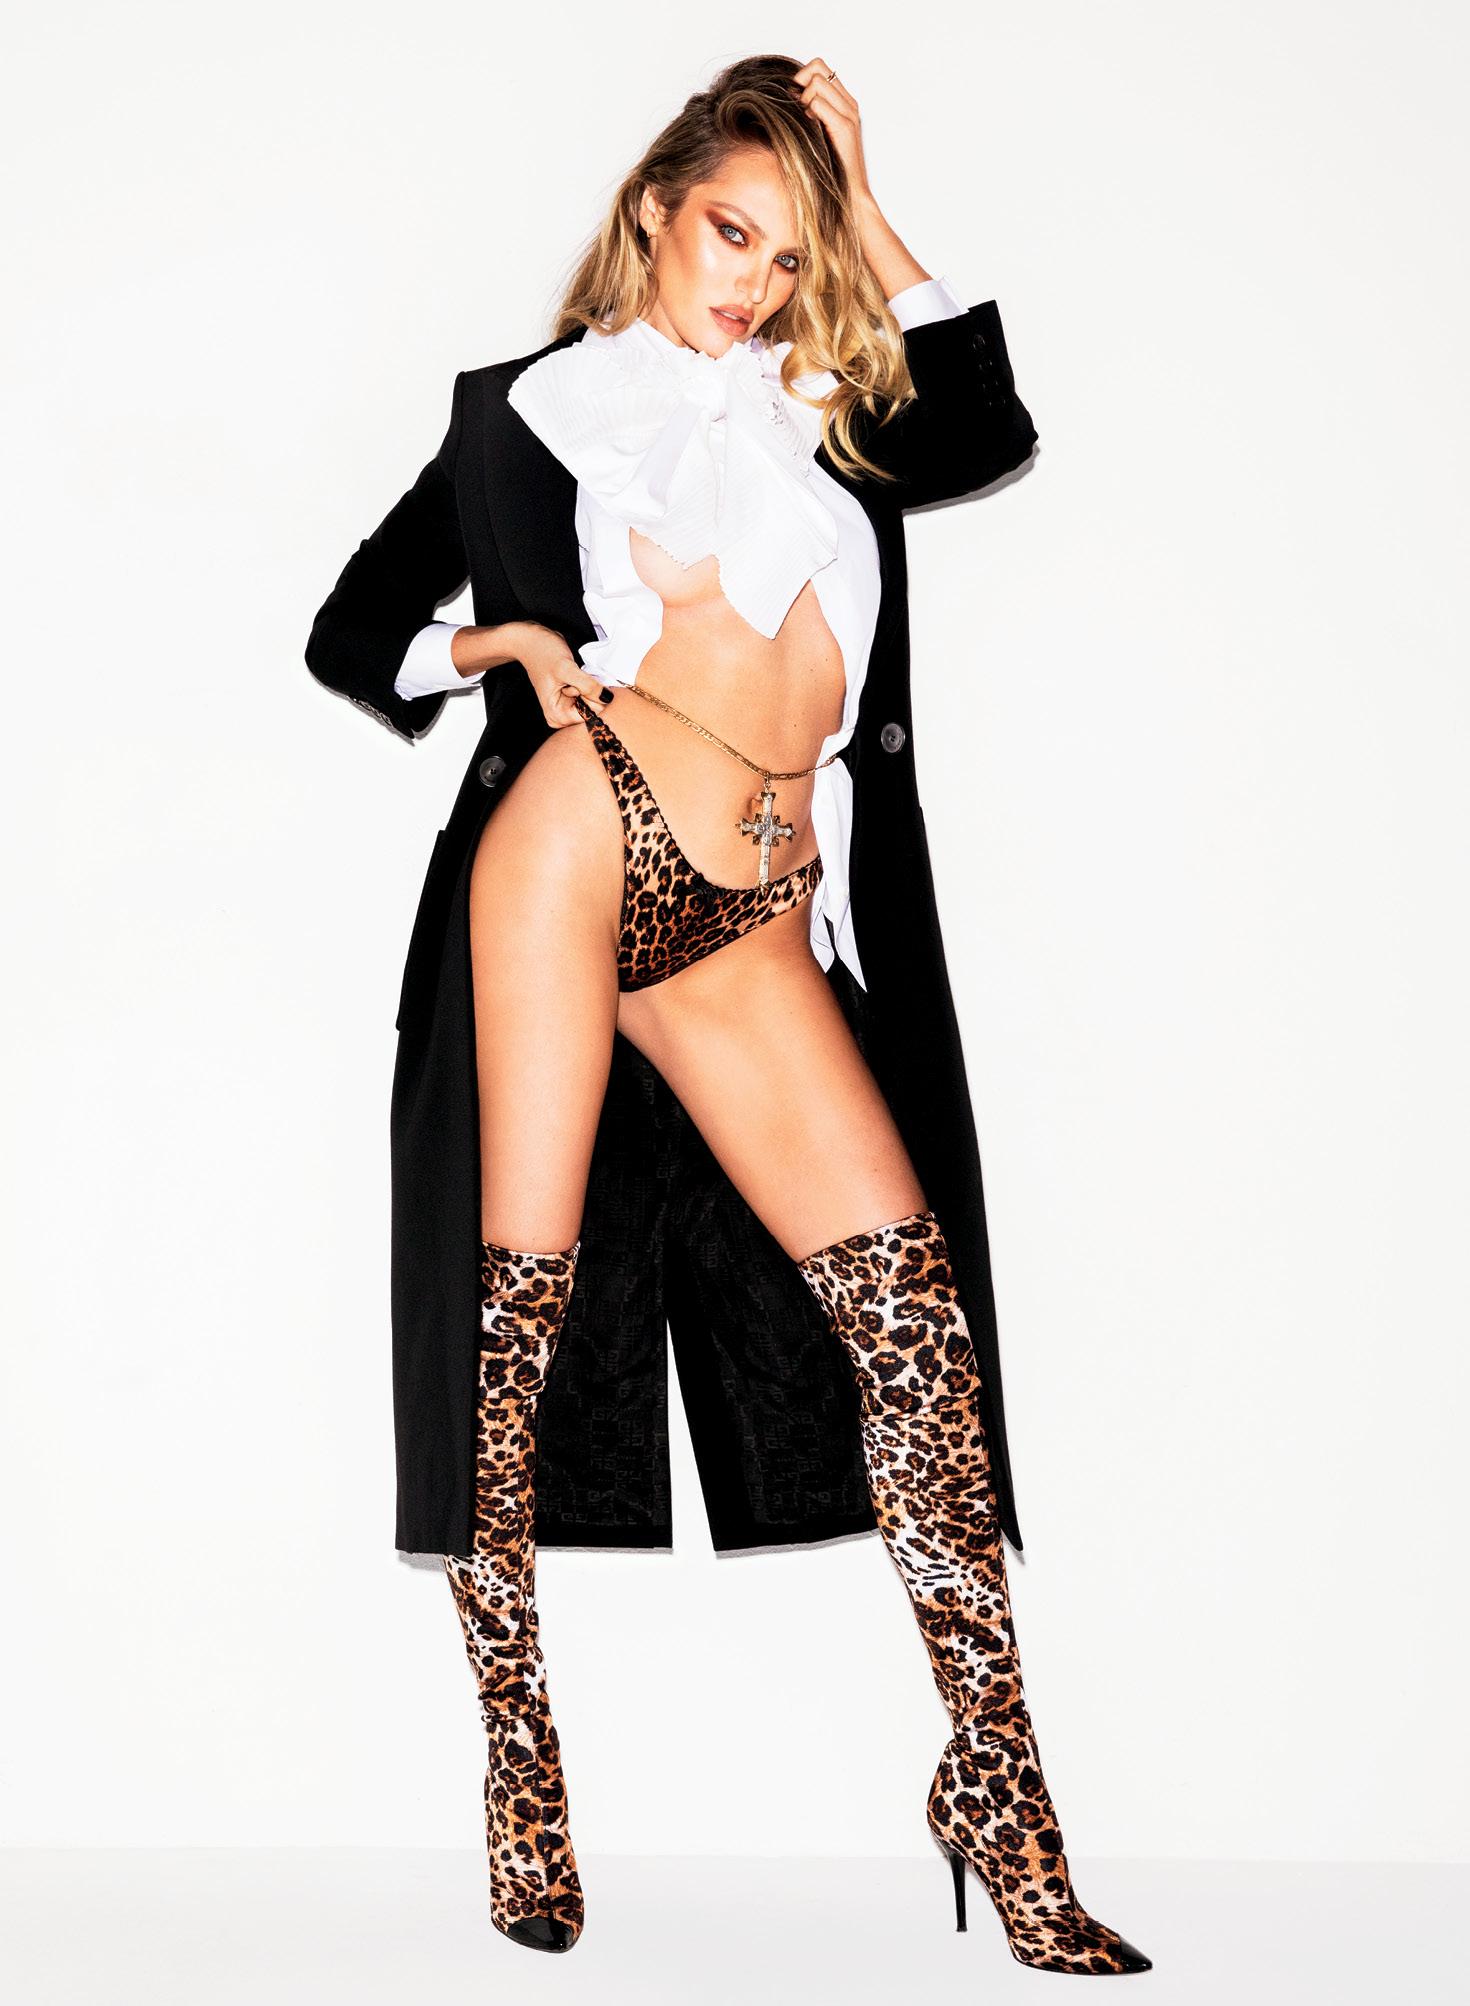 Candice Swanepoel by Carin Backoff for GLAMORAMA (November 2018)